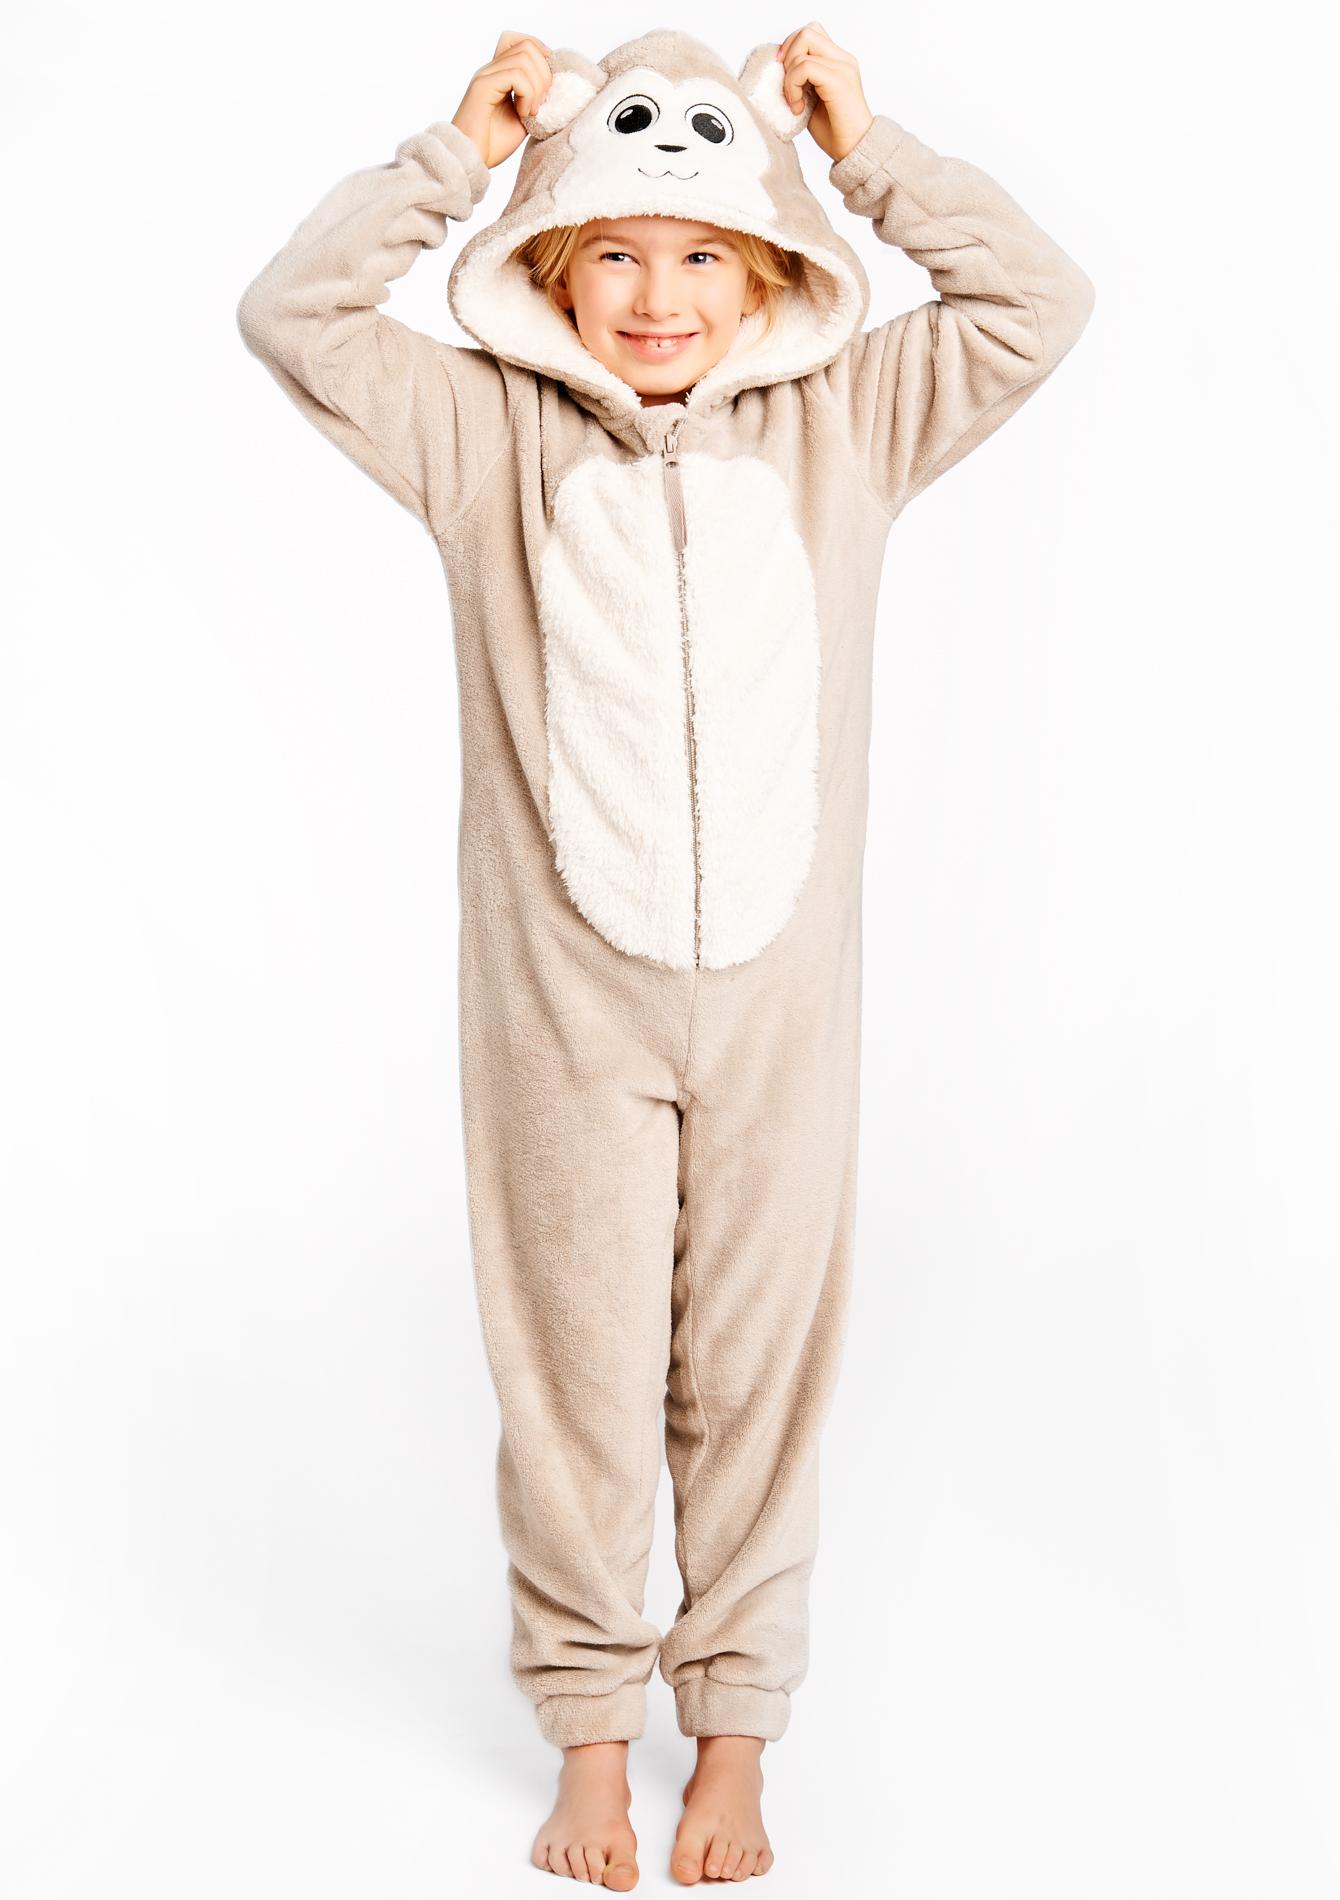 combinaison pyjama enfant style singe lolaliza. Black Bedroom Furniture Sets. Home Design Ideas